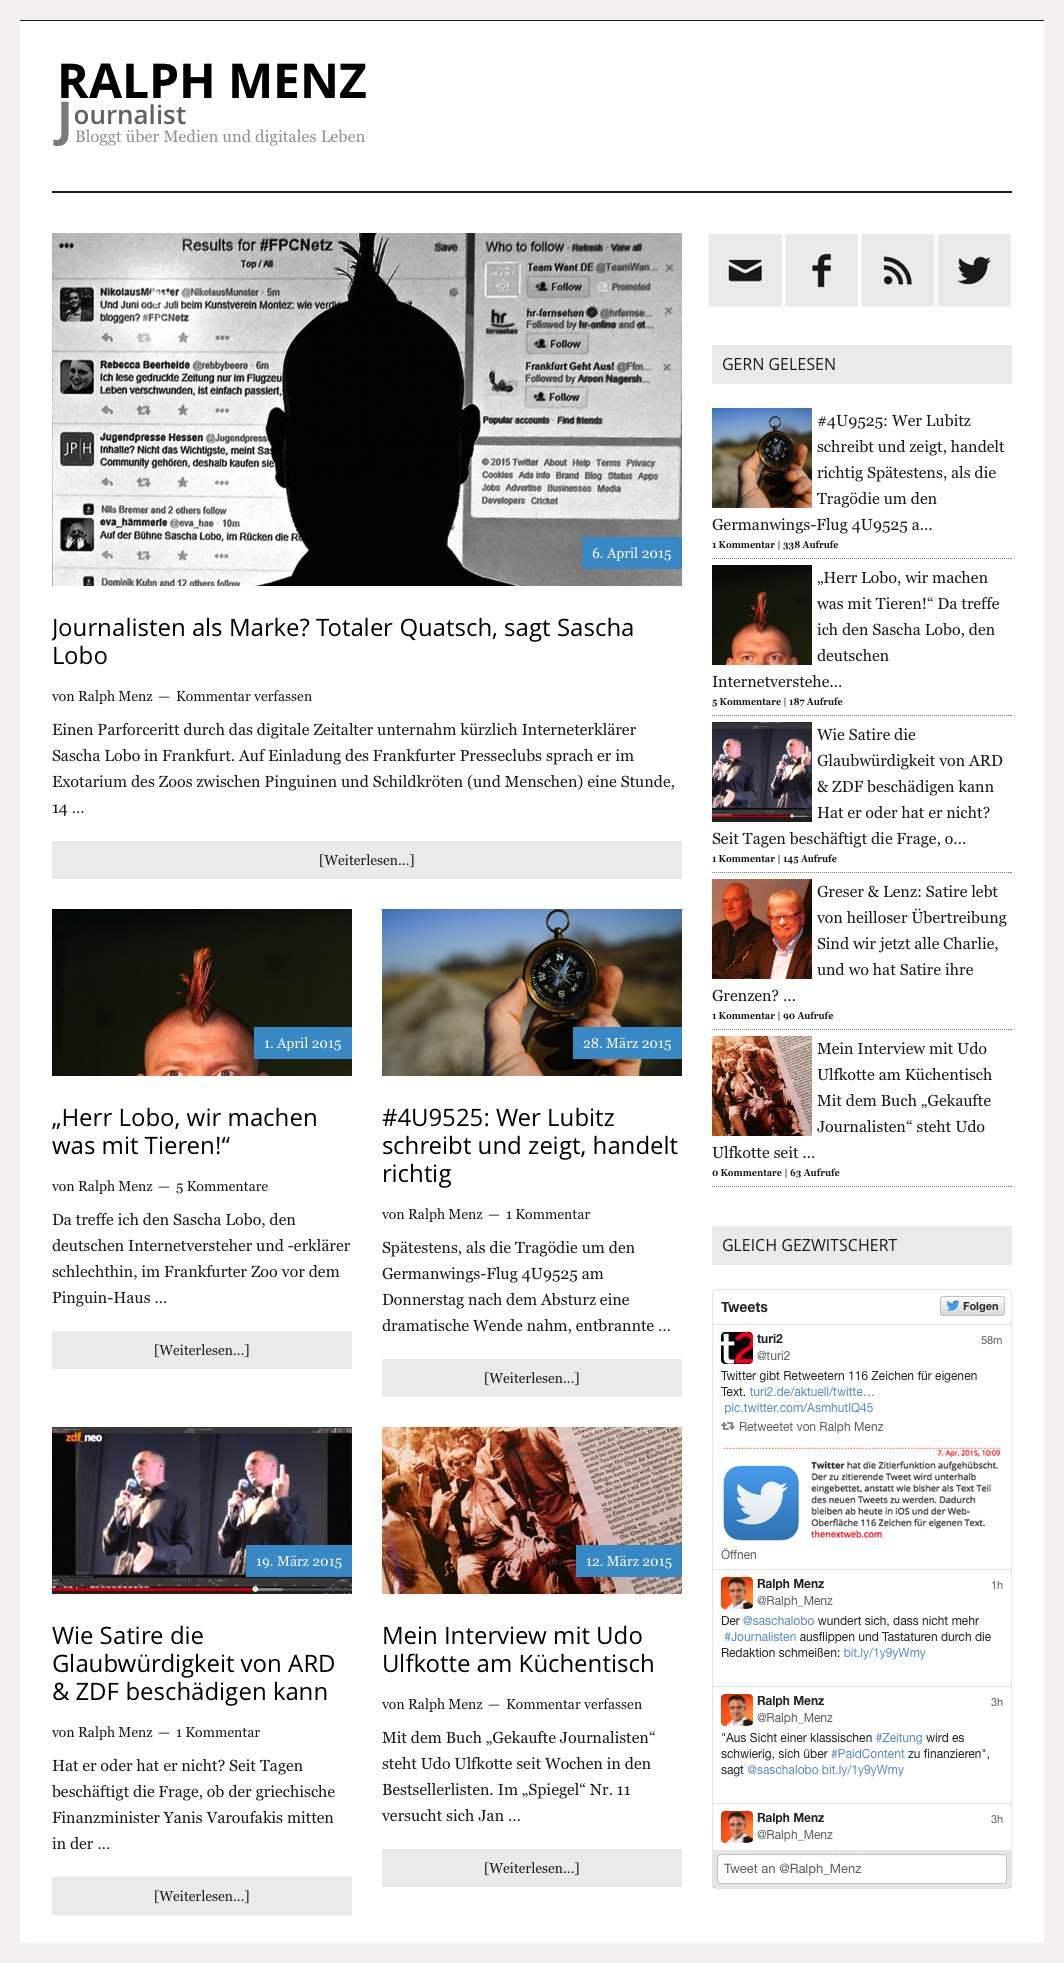 onlineprofiler-portfolio-ralph-menz-de